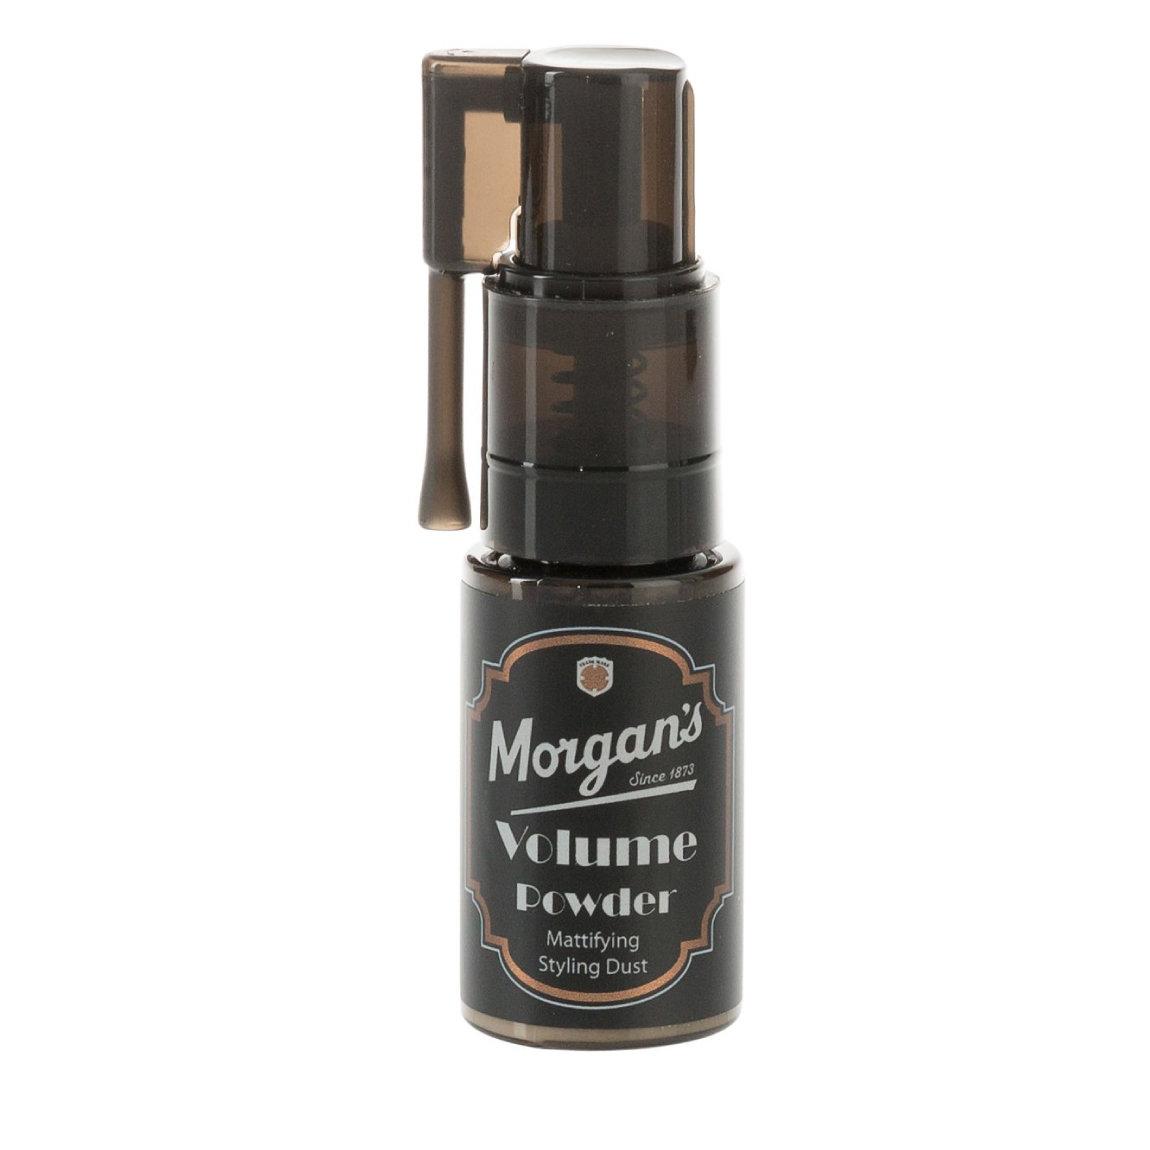 MORGAN'S Volume Powder - Матирующая пудра для придания объема волосам 5 г